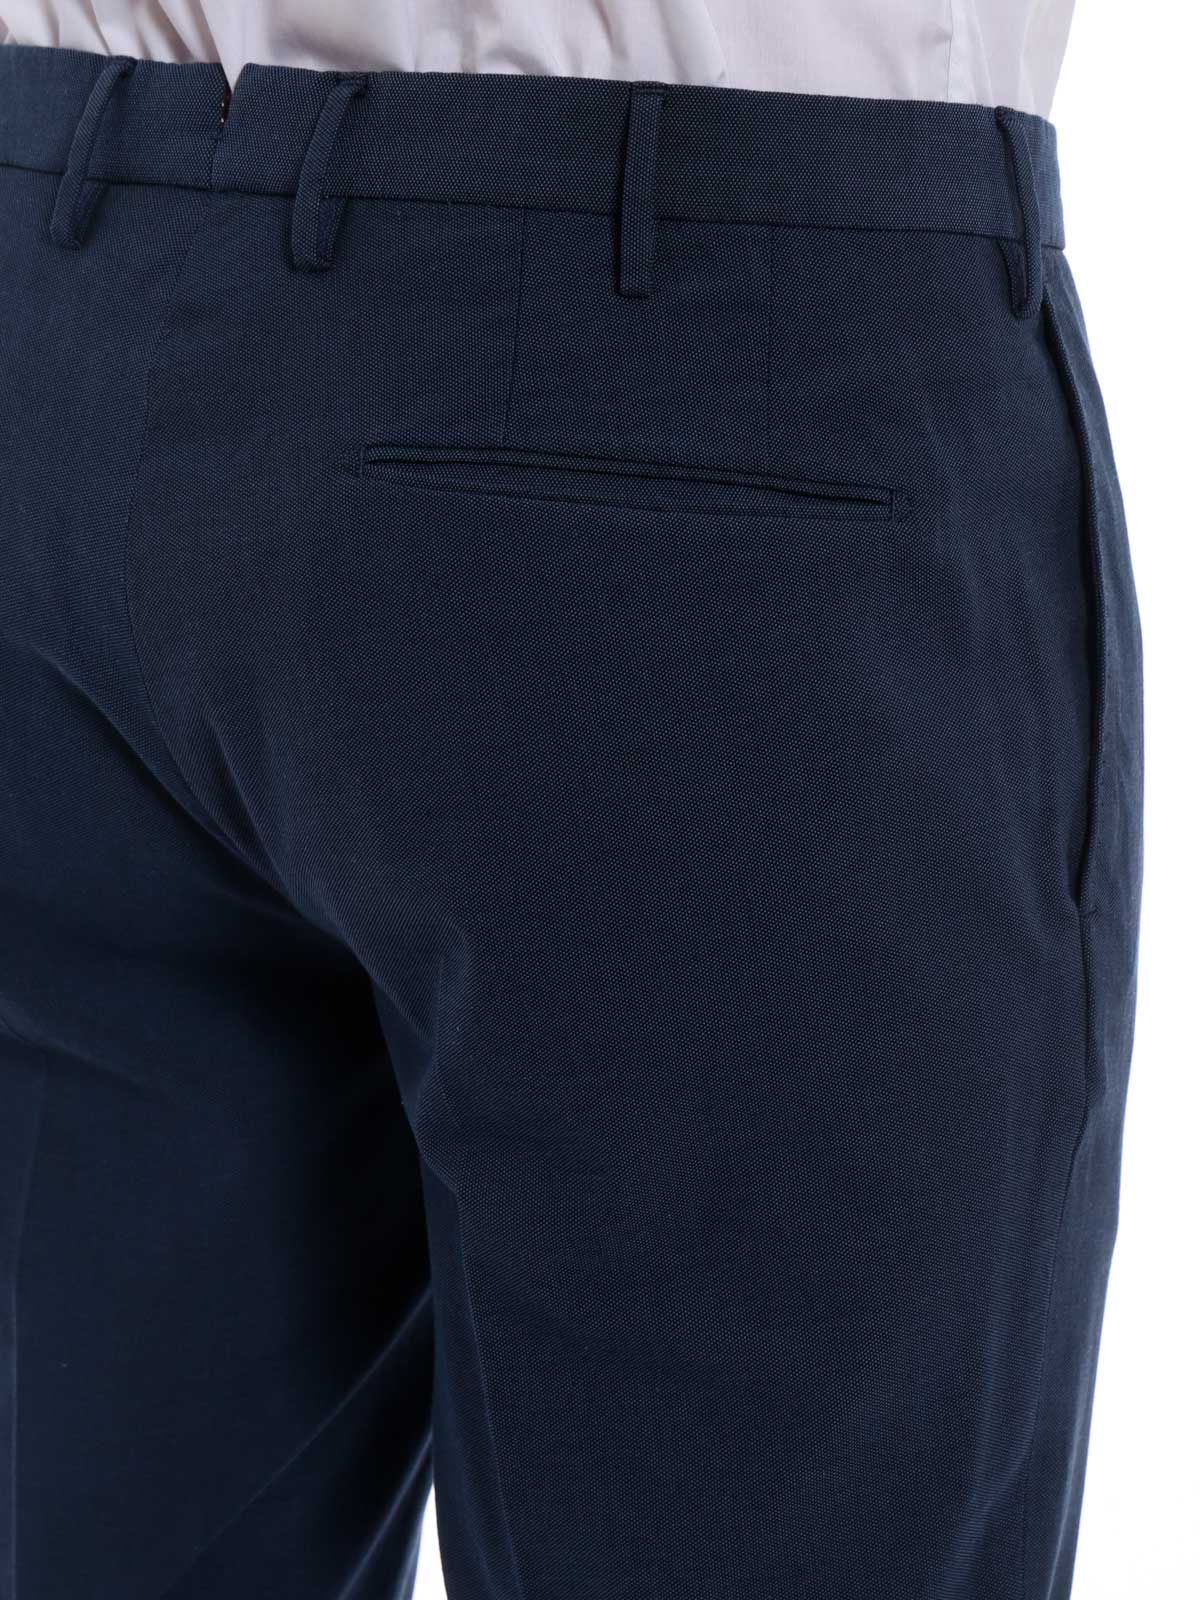 Picture of INCOTEX | Men's Cotton Jacquard Trousers